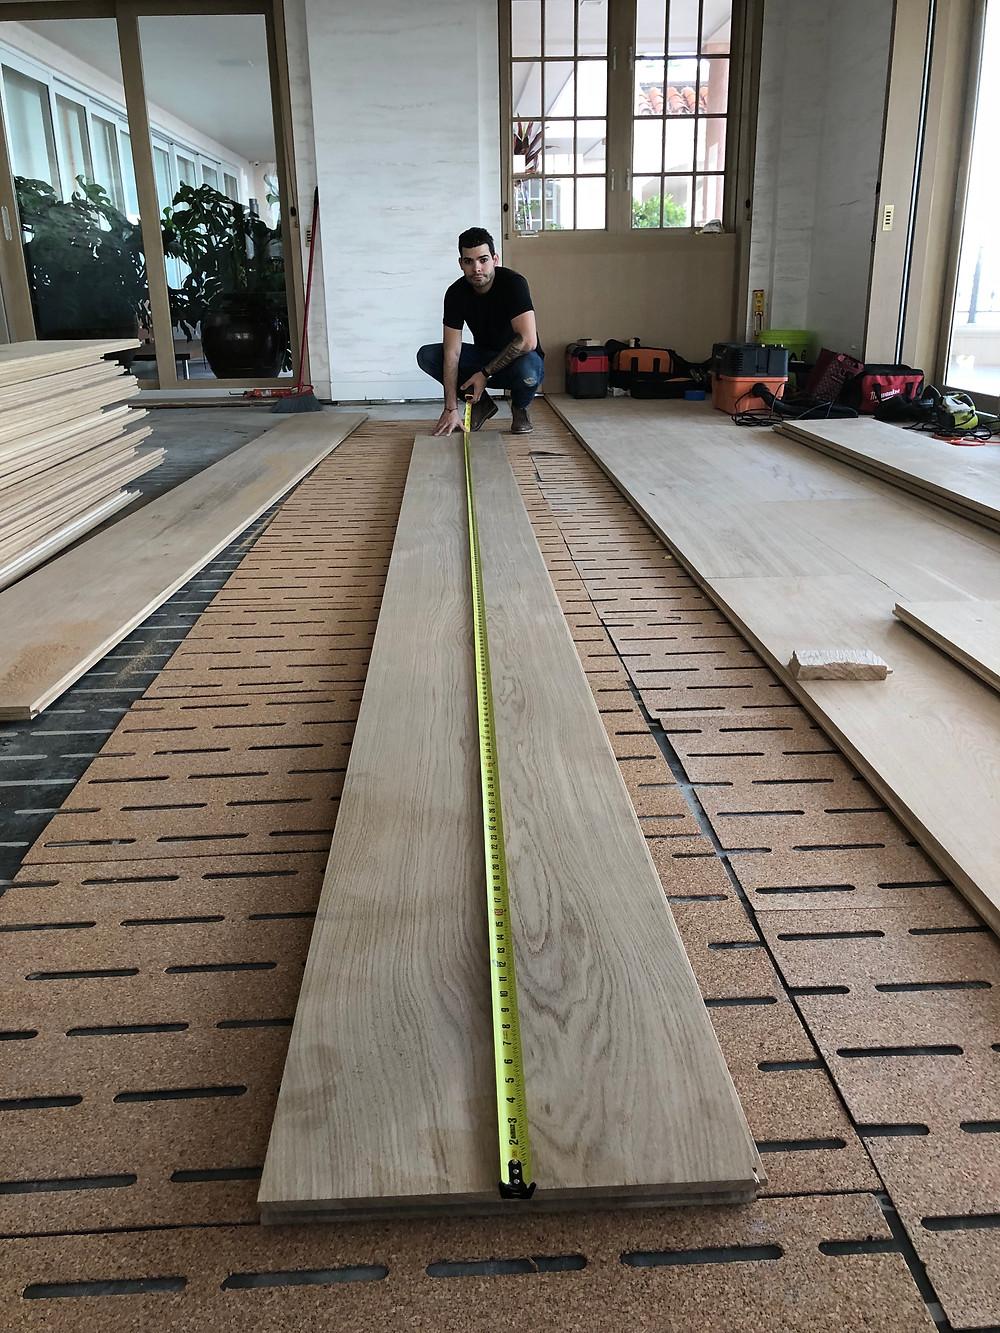 White oak wood floor installers, White oak hardwood flooring installation process